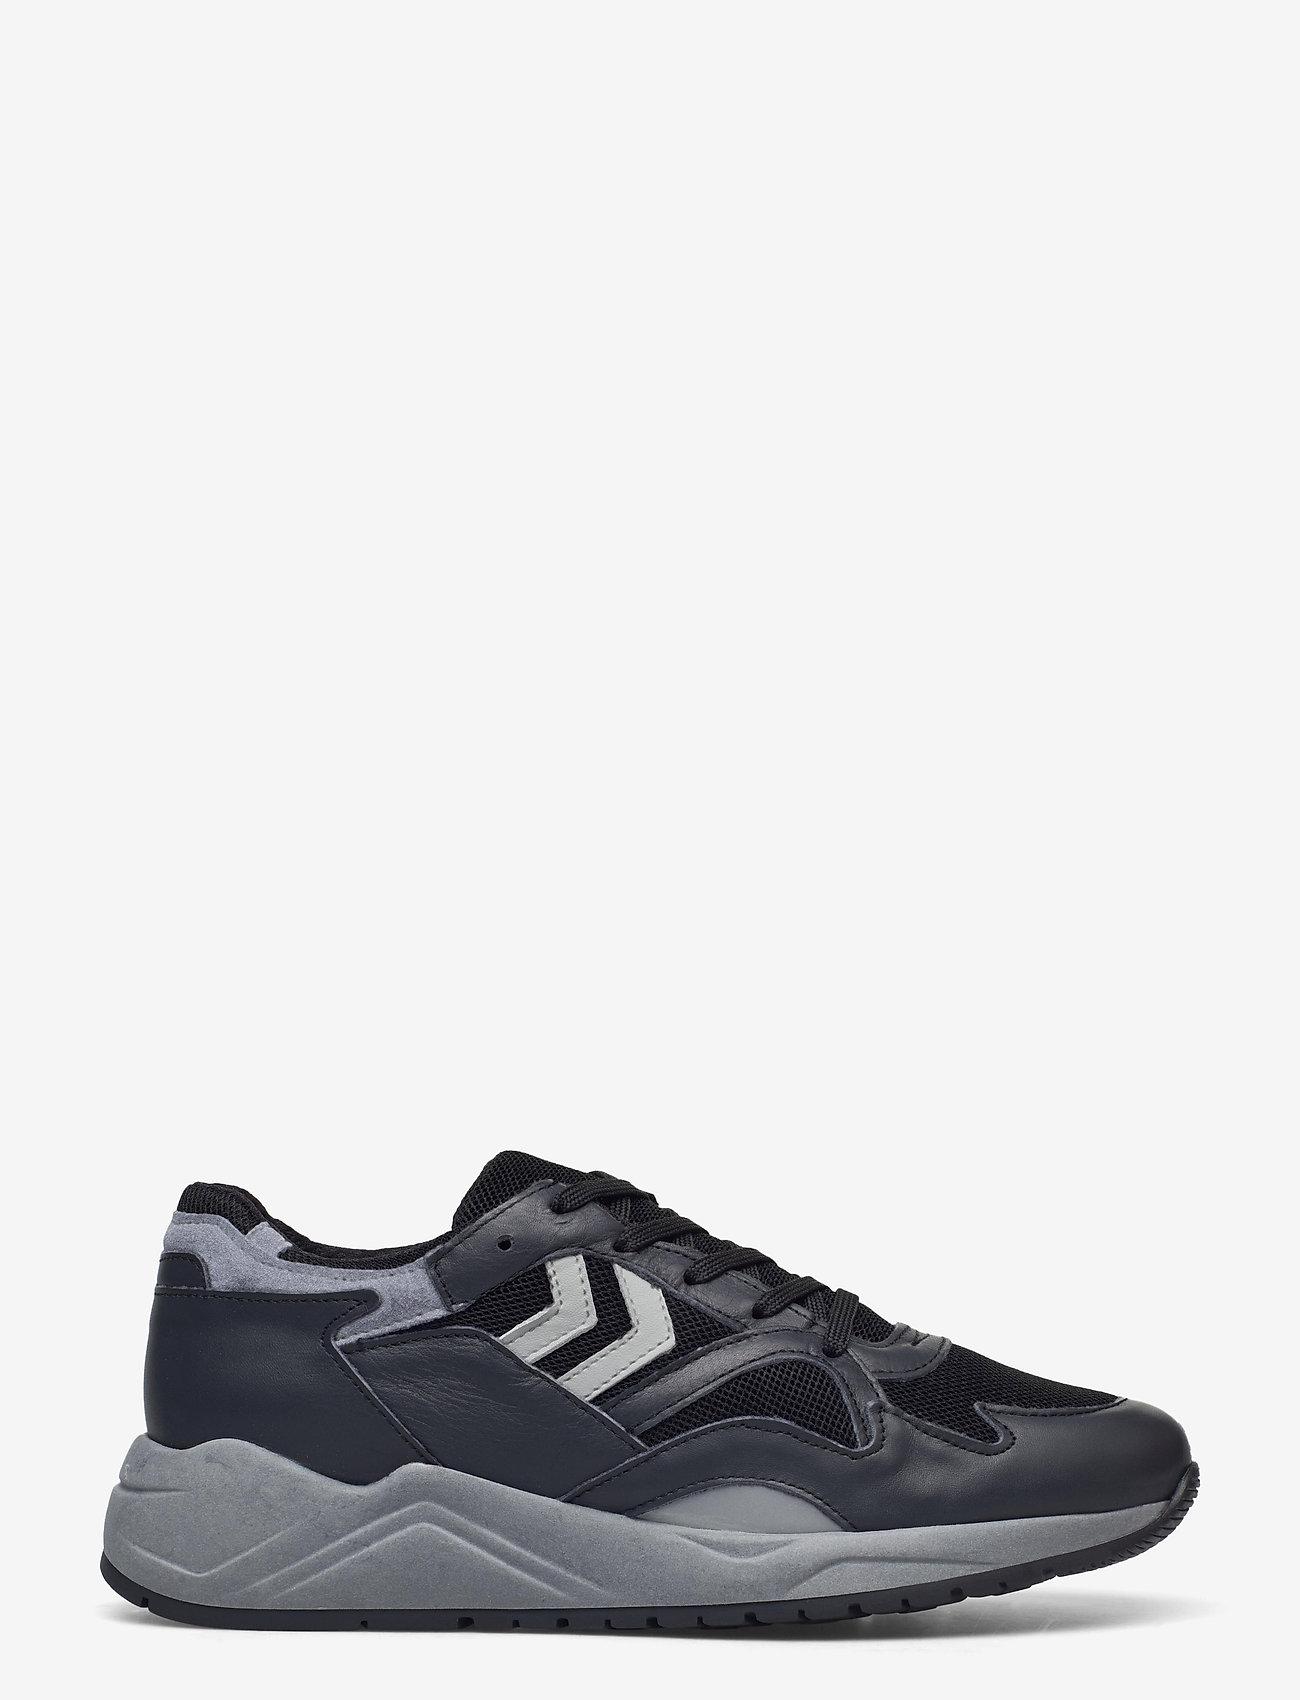 Hummel - EDMONTON HIVE - laag sneakers - black - 1